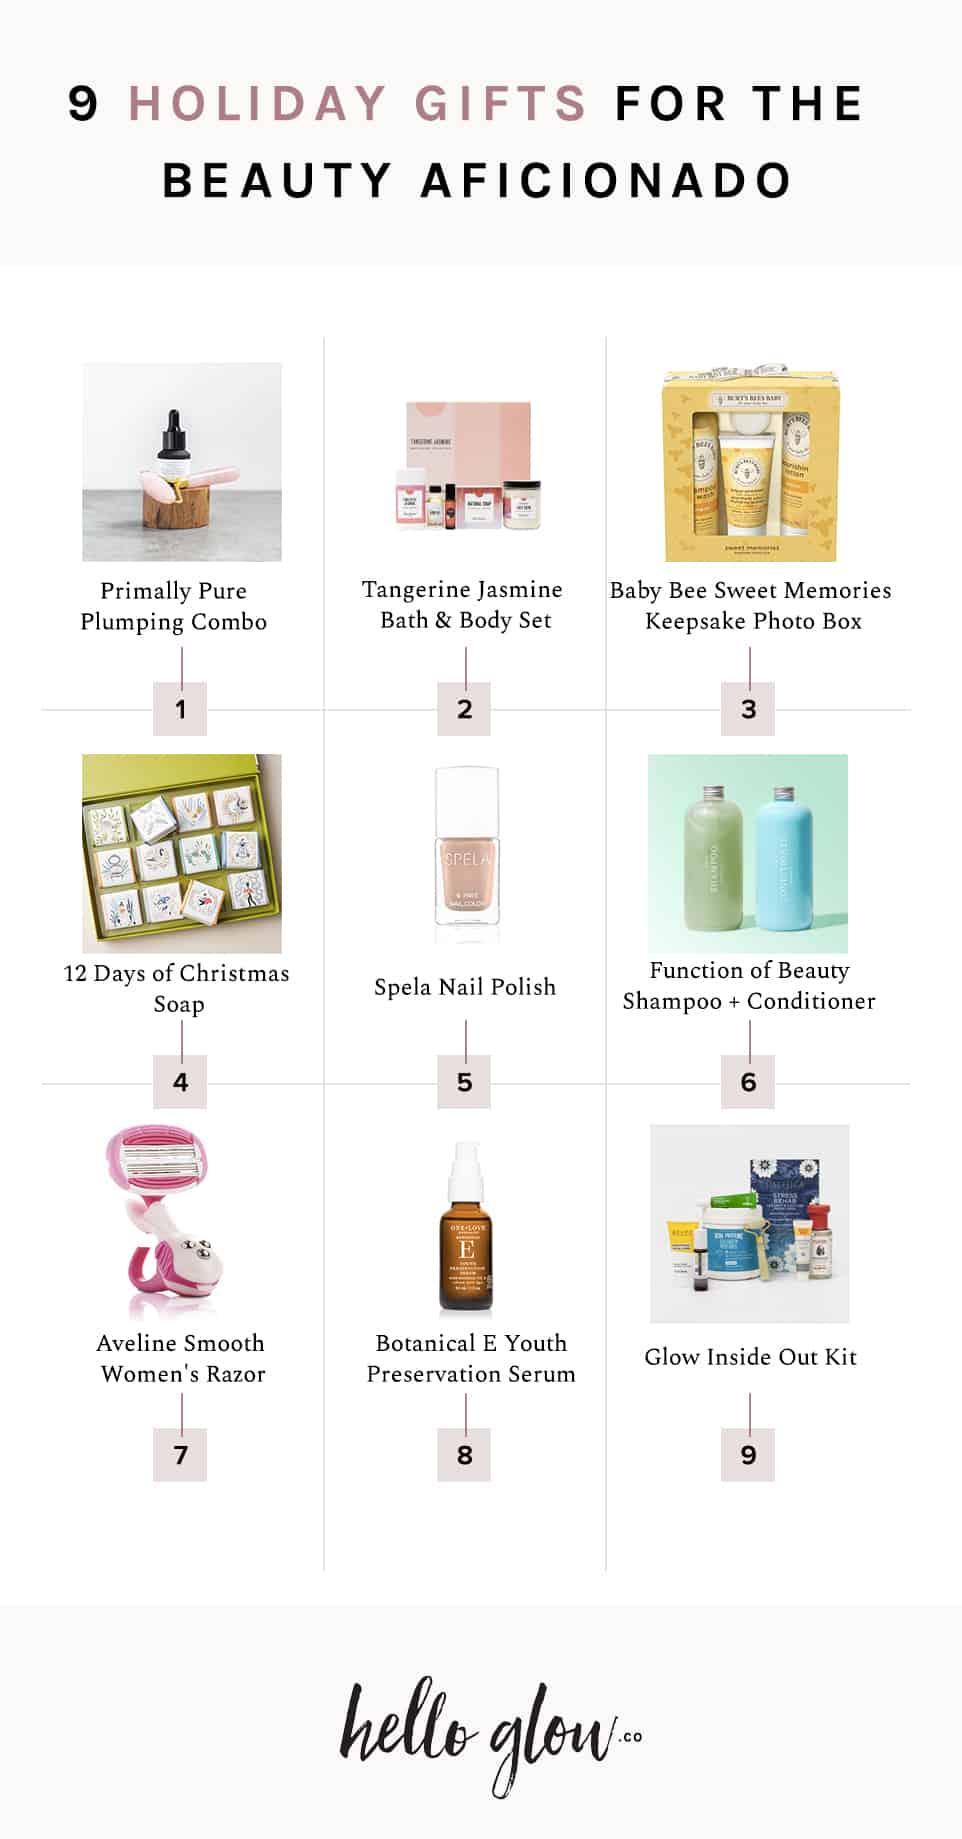 9 Holiday Gifts for the Beauty Aficionado - HelloGlow.co